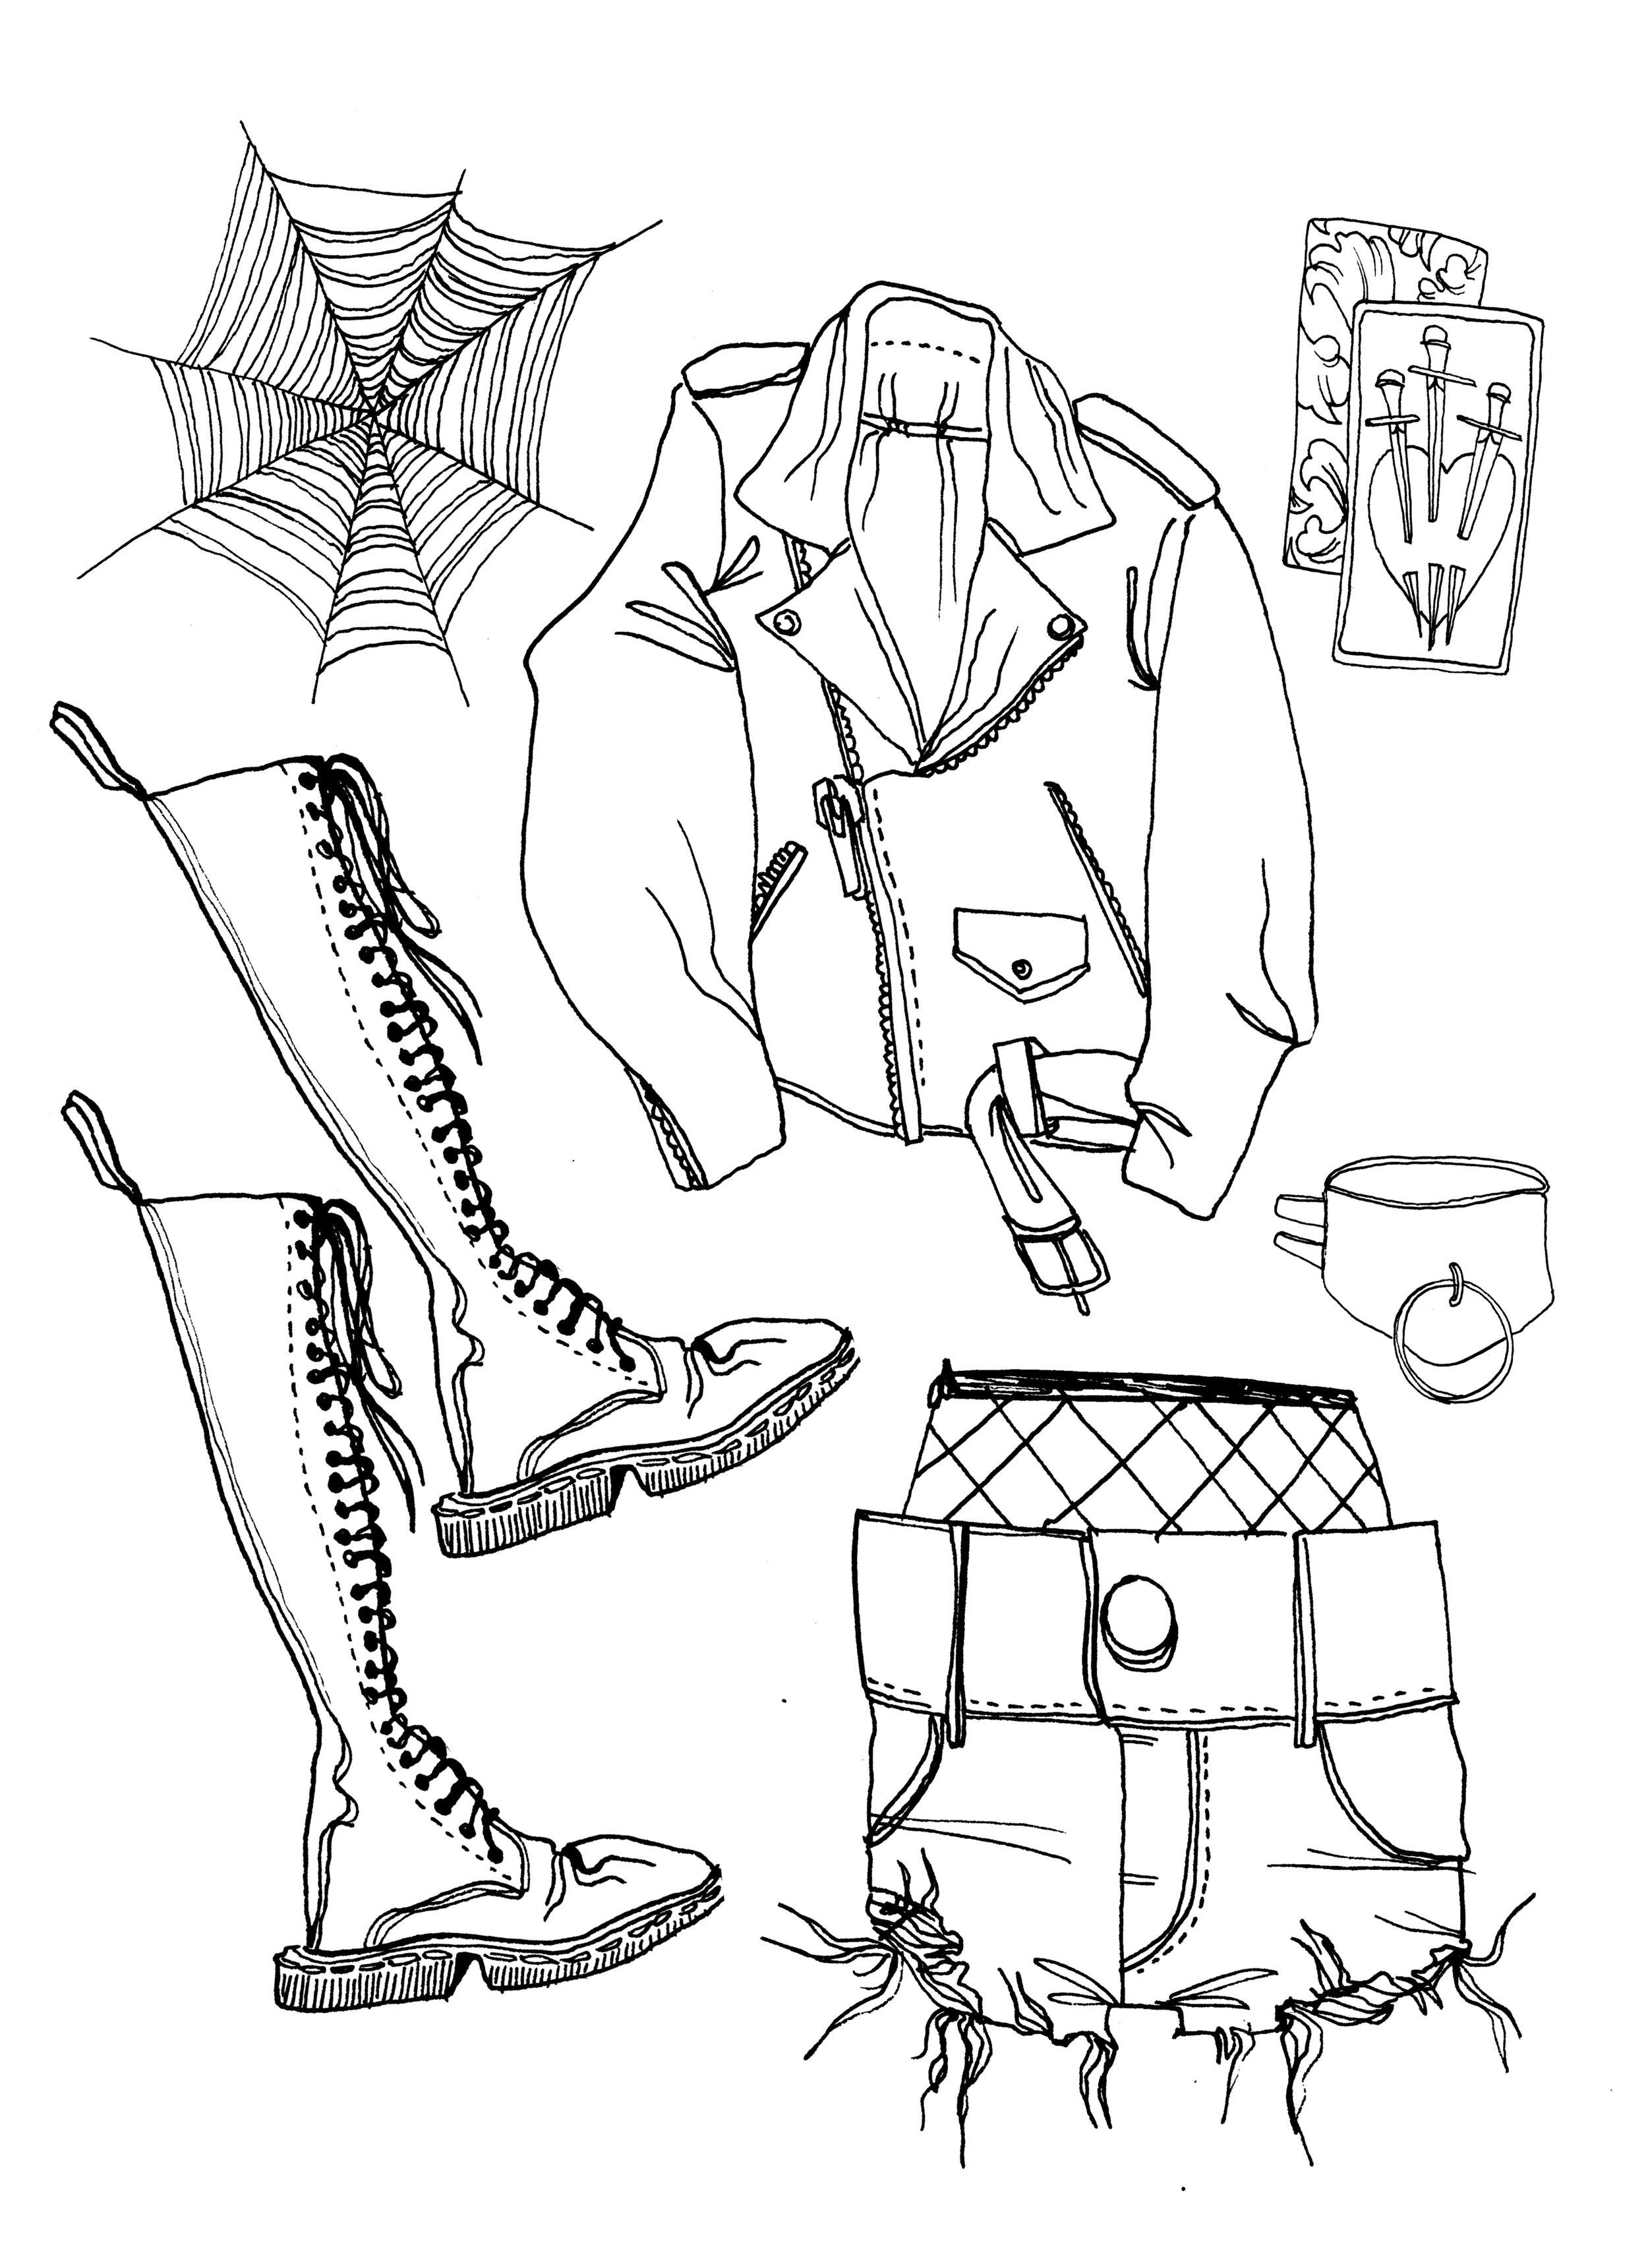 The Goth Galz Style interpreted by Amy Leonard